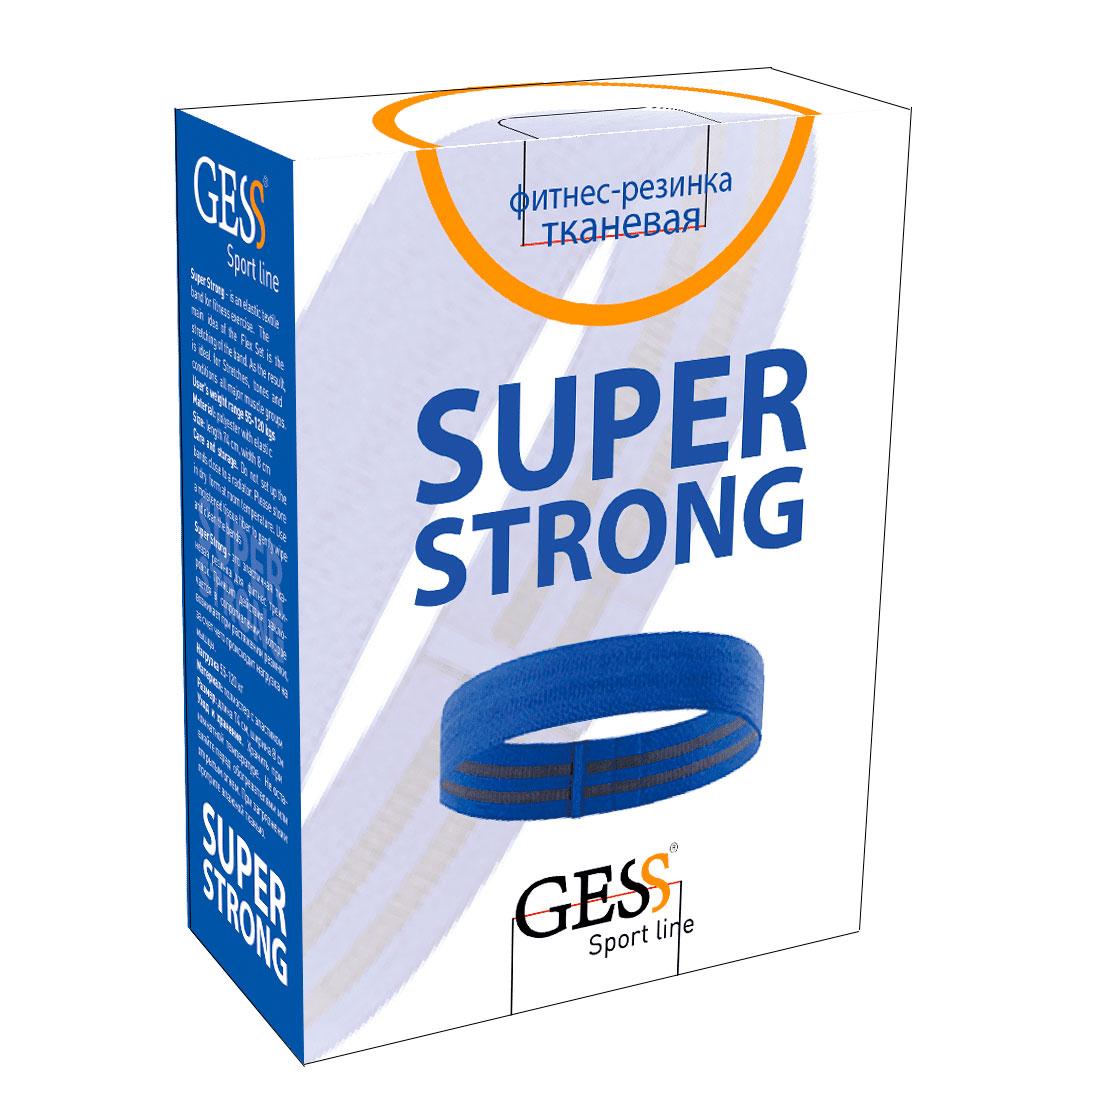 Super Strong тканевая фитнес-резинка